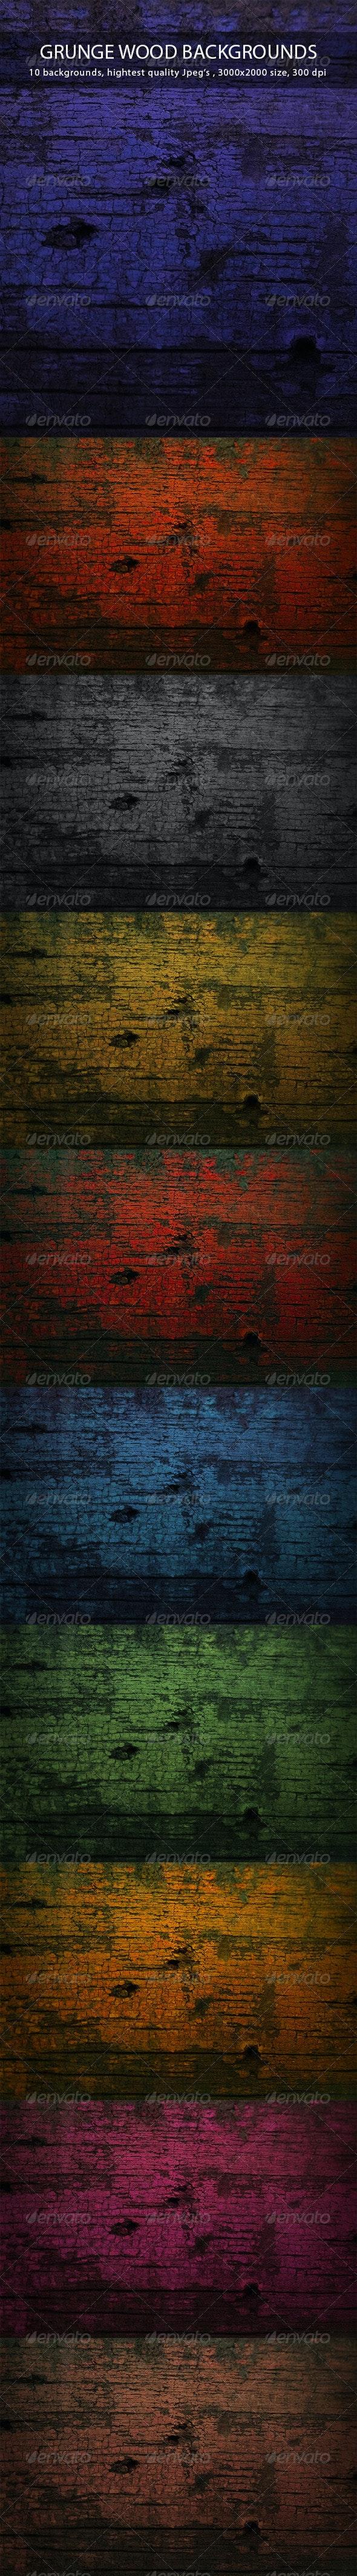 Grunge Wood Backgrounds - Nature Backgrounds